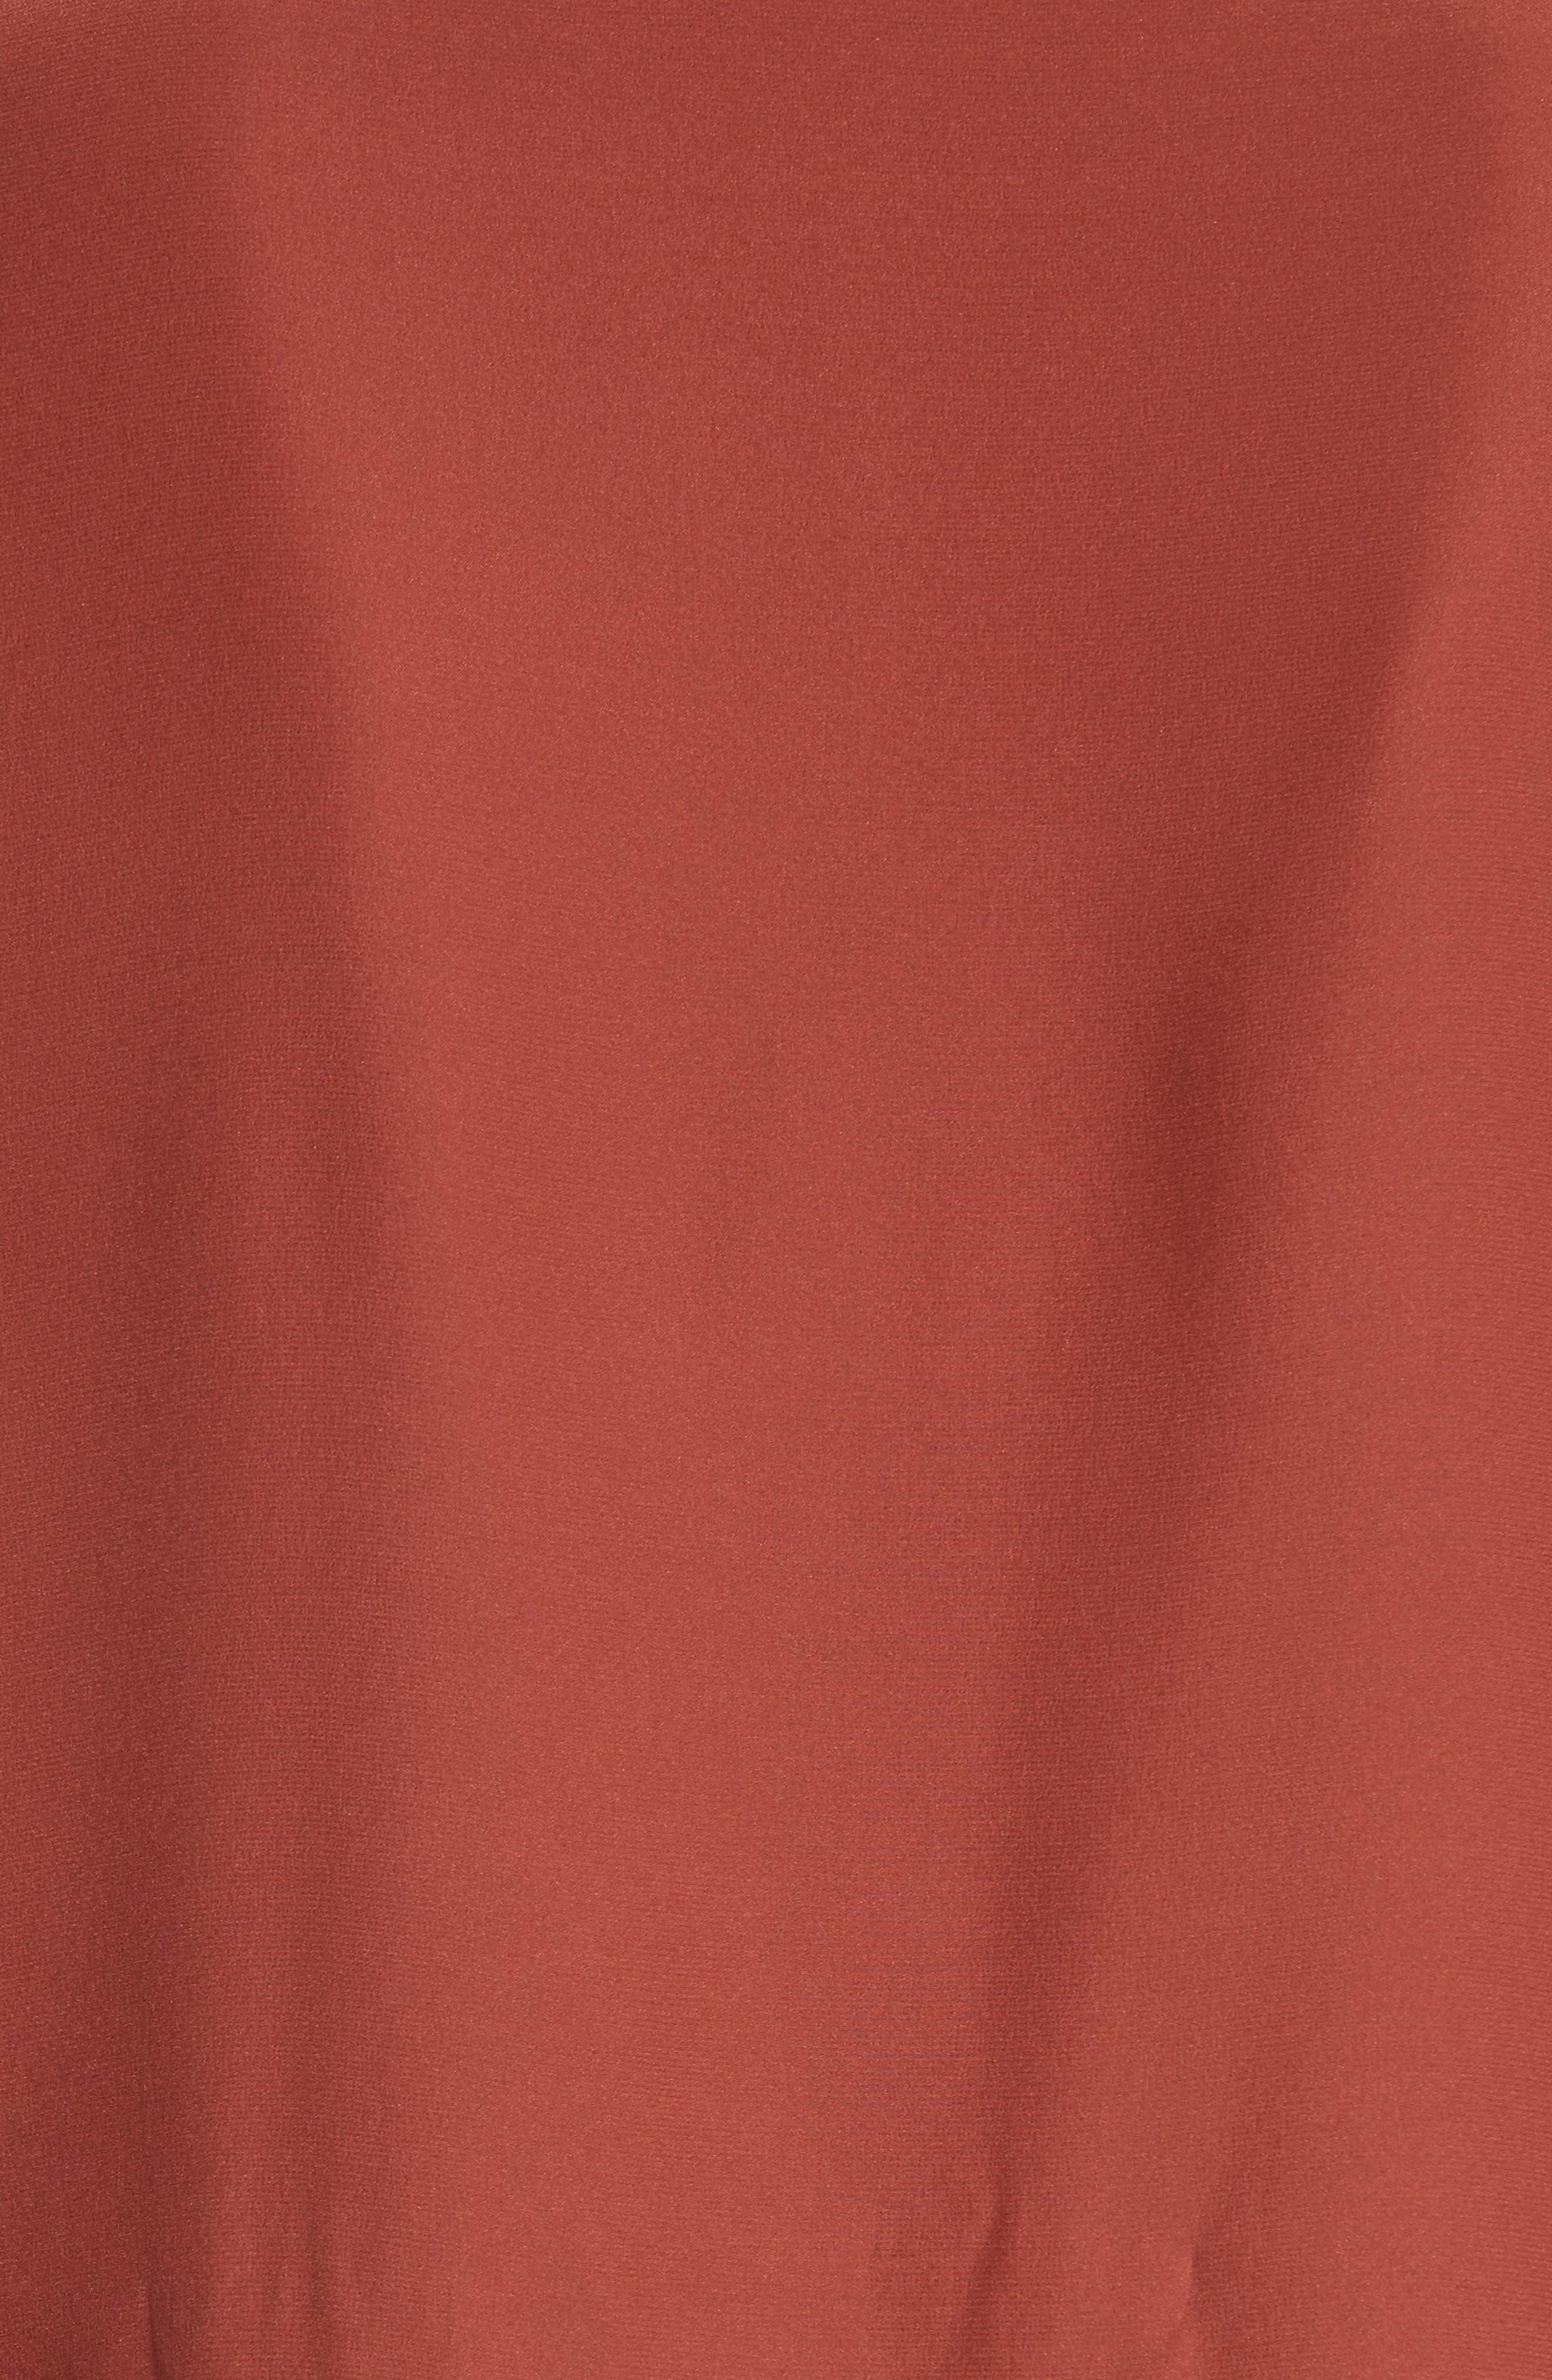 Norla Silk Bow Blouse,                             Alternate thumbnail 5, color,                             845